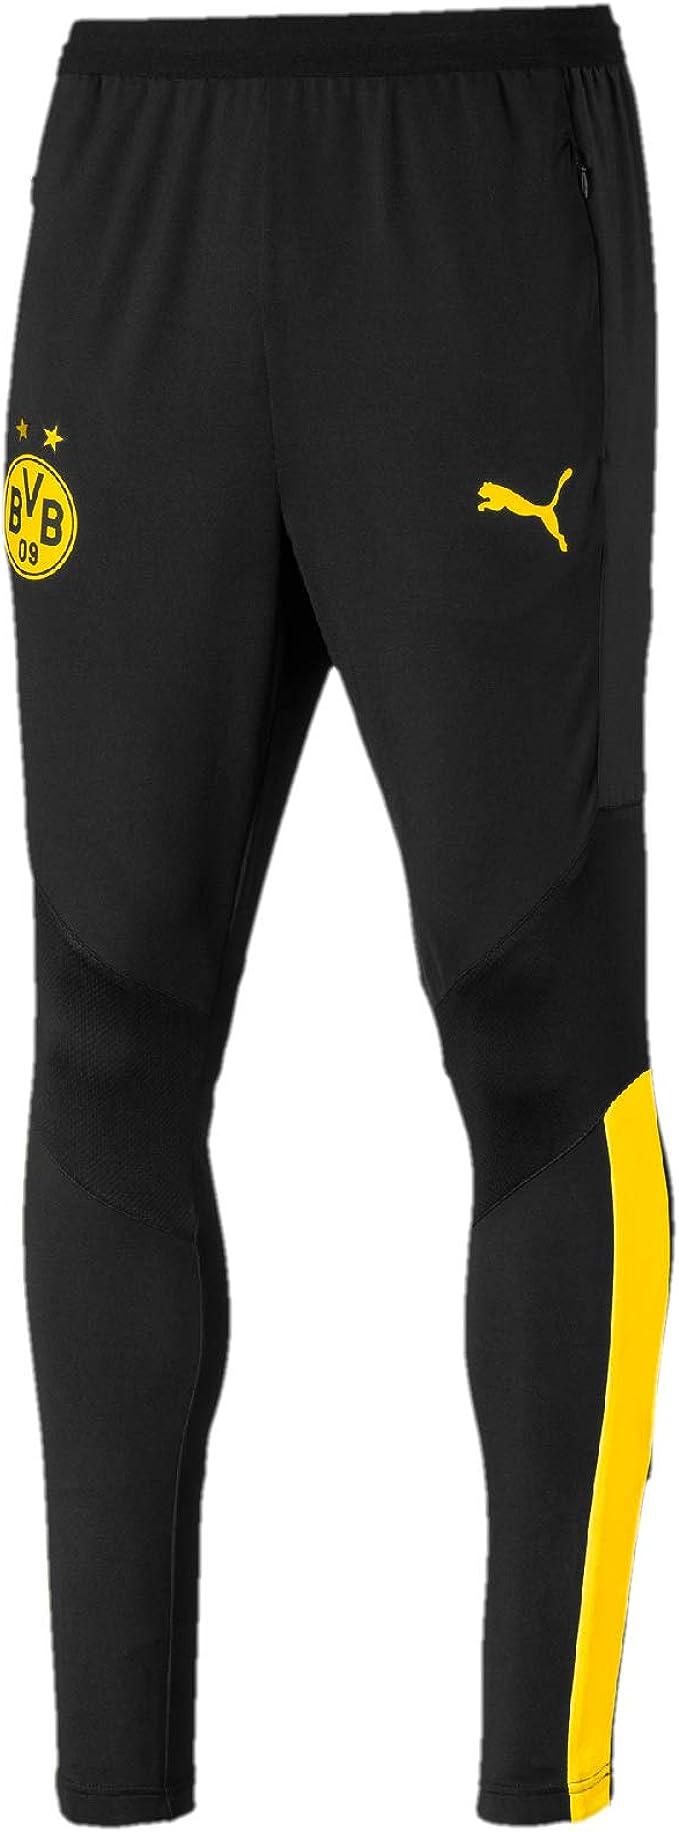 PUMA BVB Training Pants Pro with Zip Pockets - Chándal Hombre ...